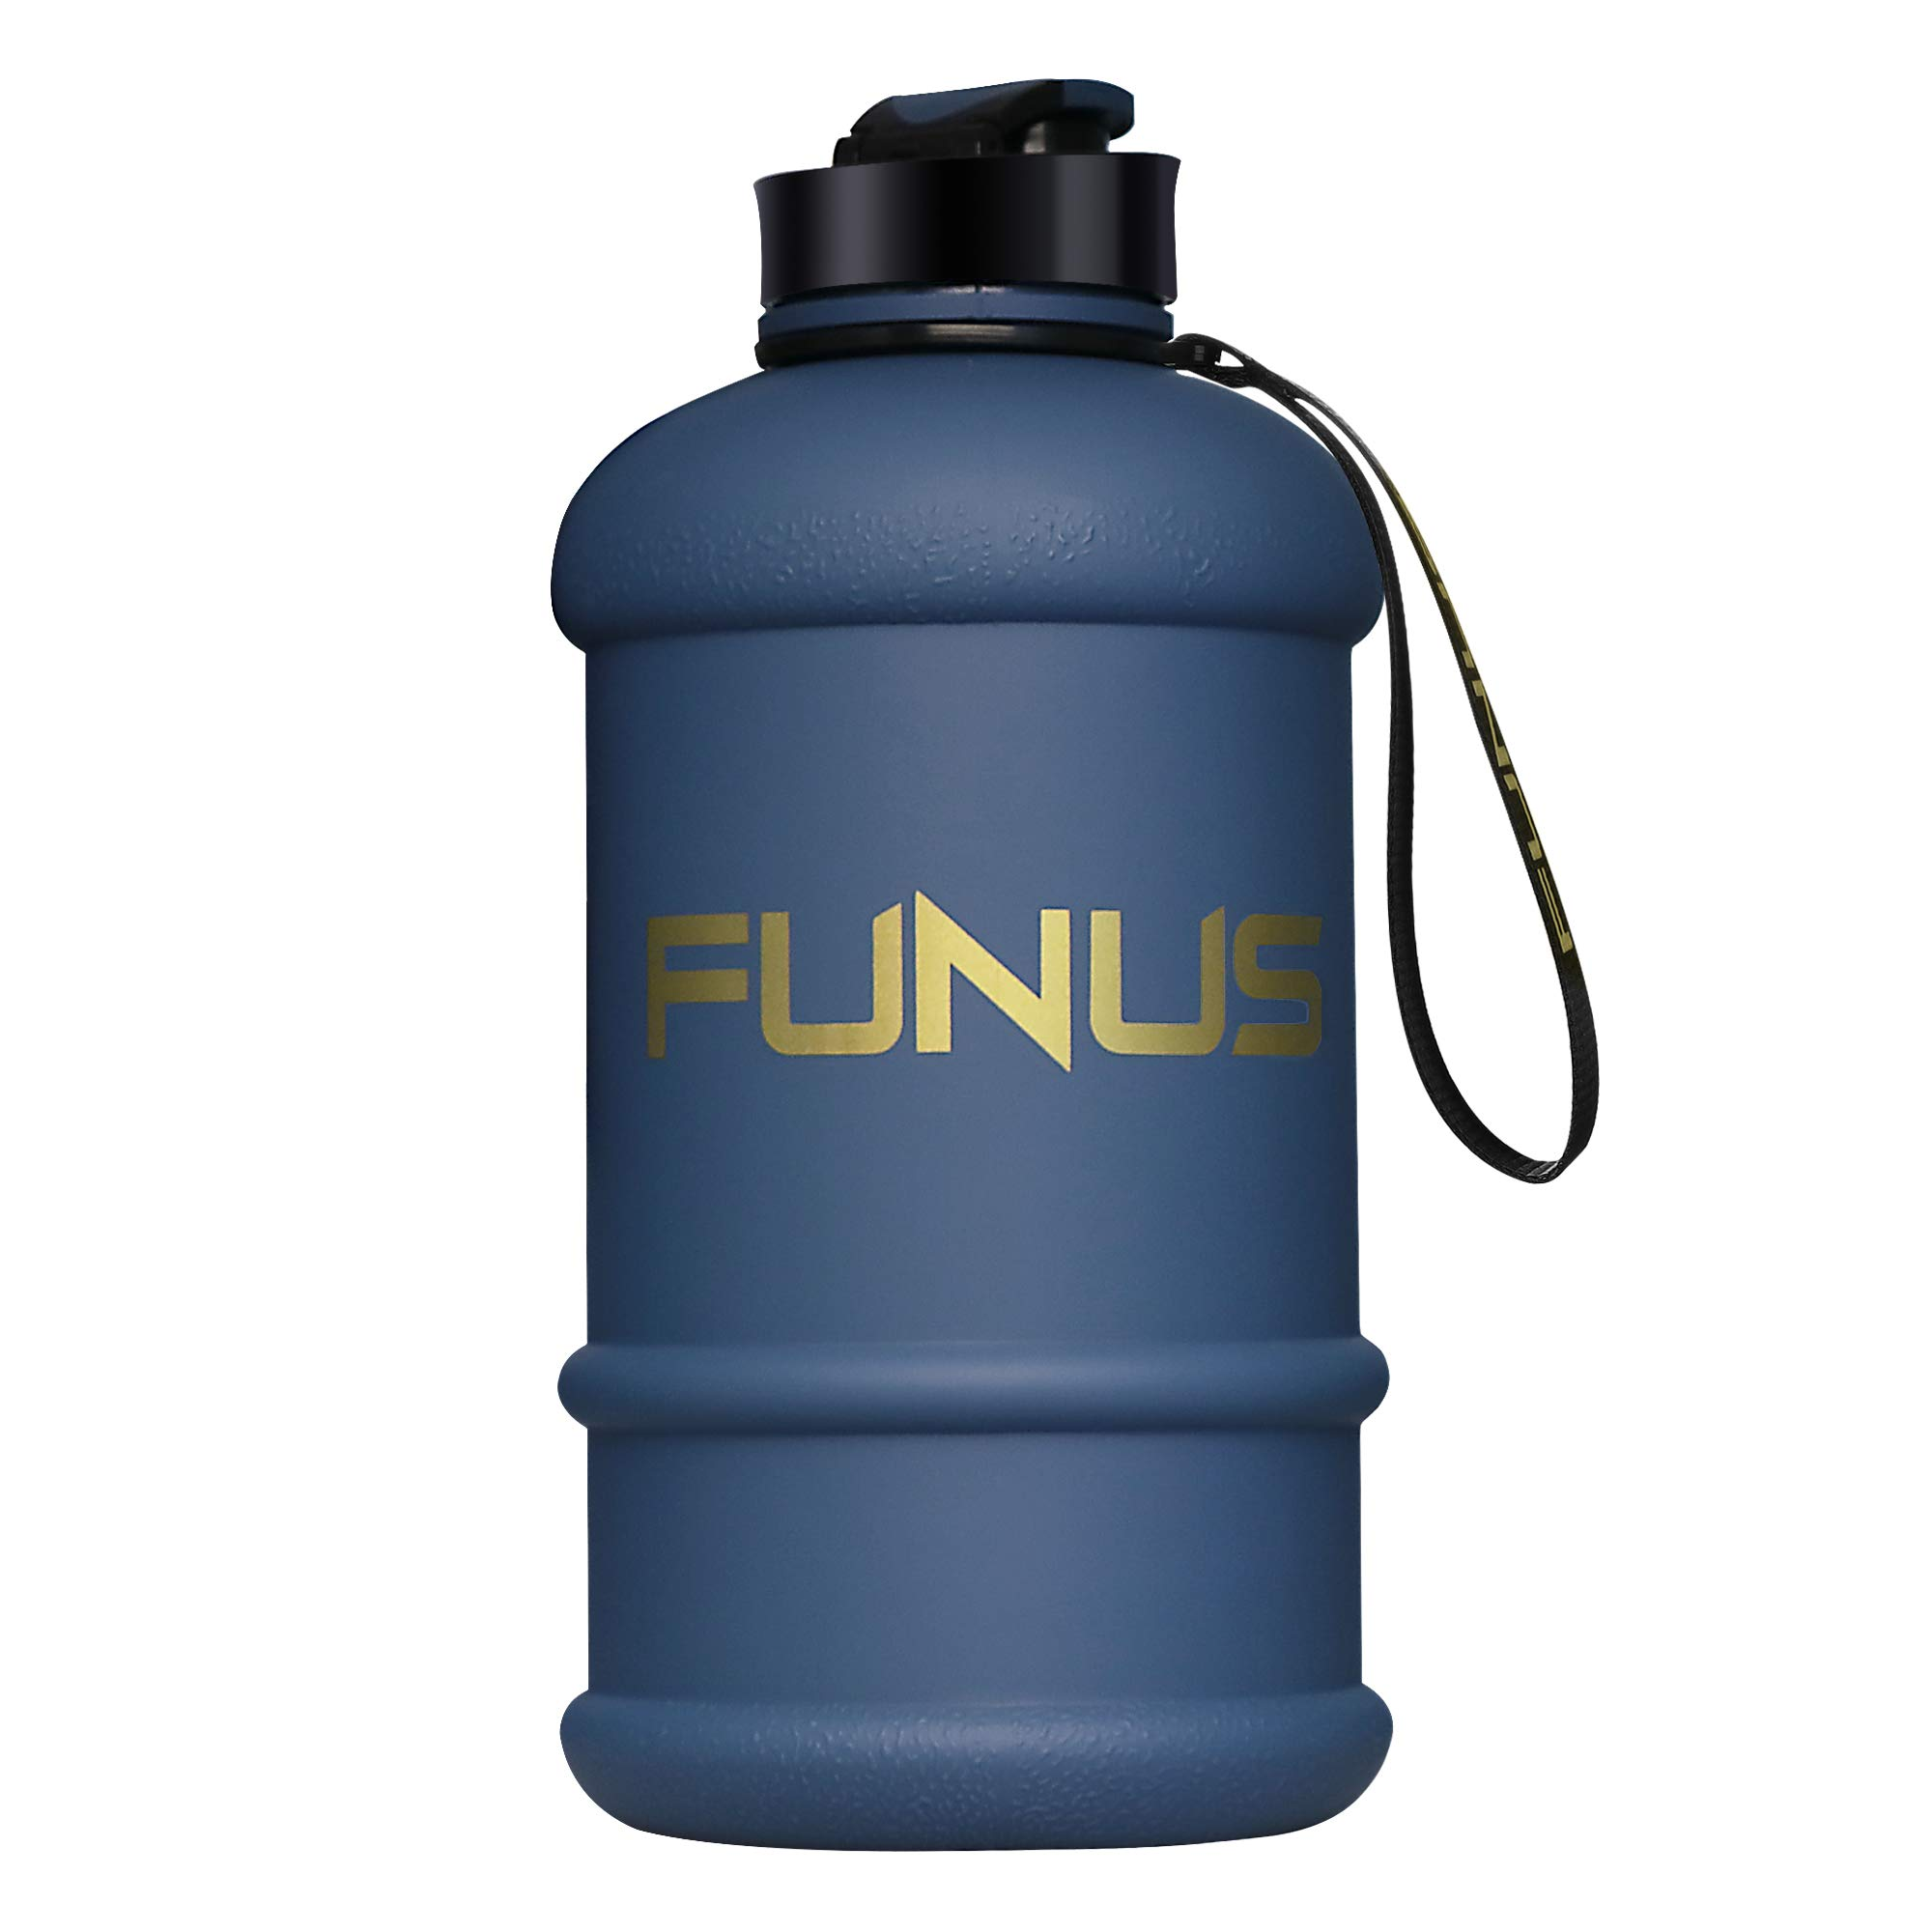 FUNUS Big Water Bottle 1.3L-2.2L Odorless Water Jug BPA Free Leak Proof Reusable Big Capacity for Men Women Fitness Gym Outdoor Climbing (1.3L Navy Blue) by FUNUS